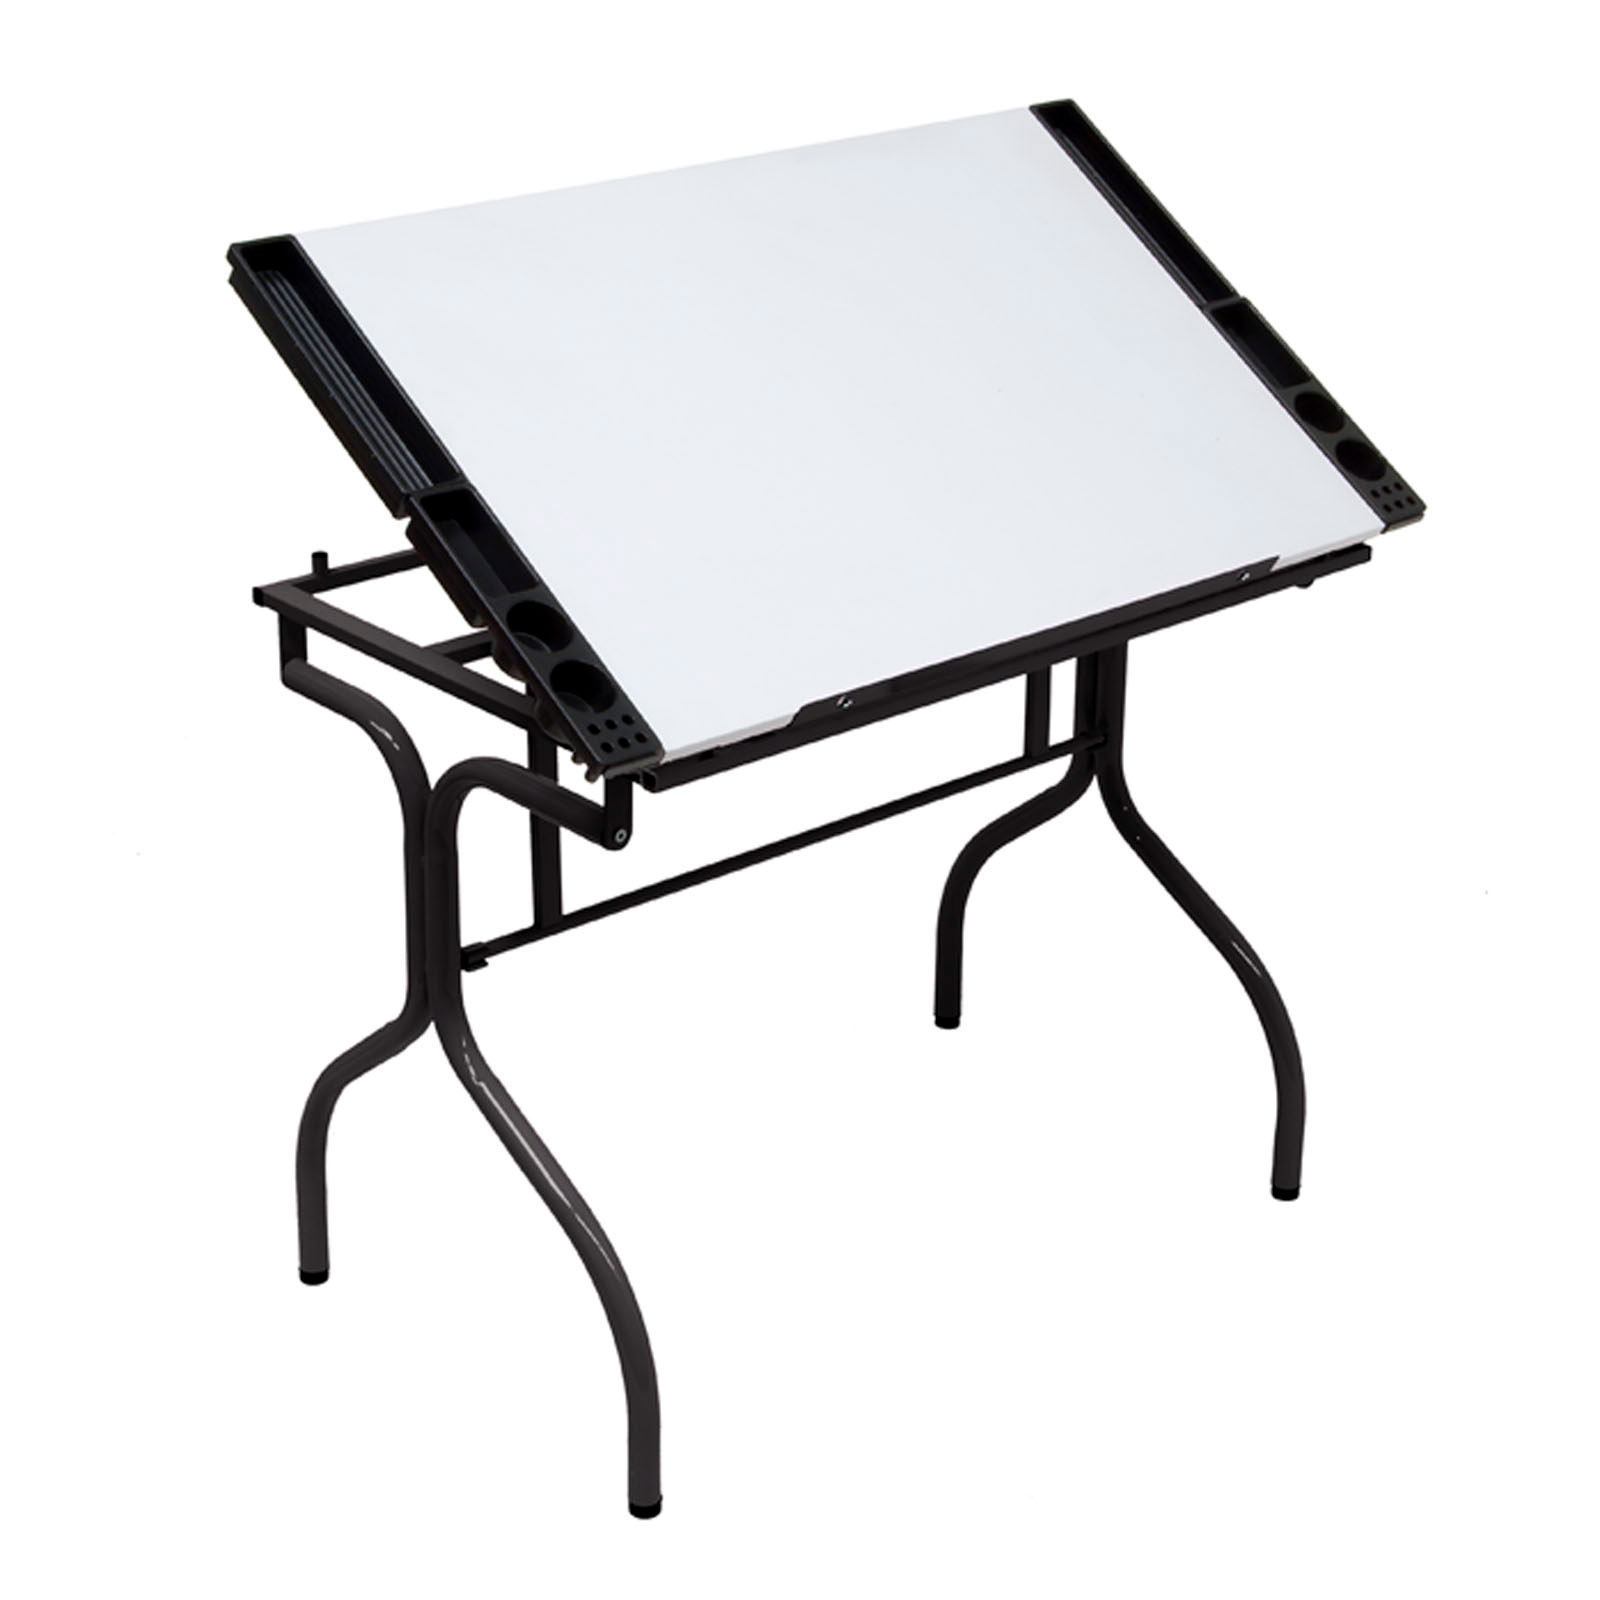 Studio Design Safety Glass Folding Art Drafting Desk Station Craft Table White